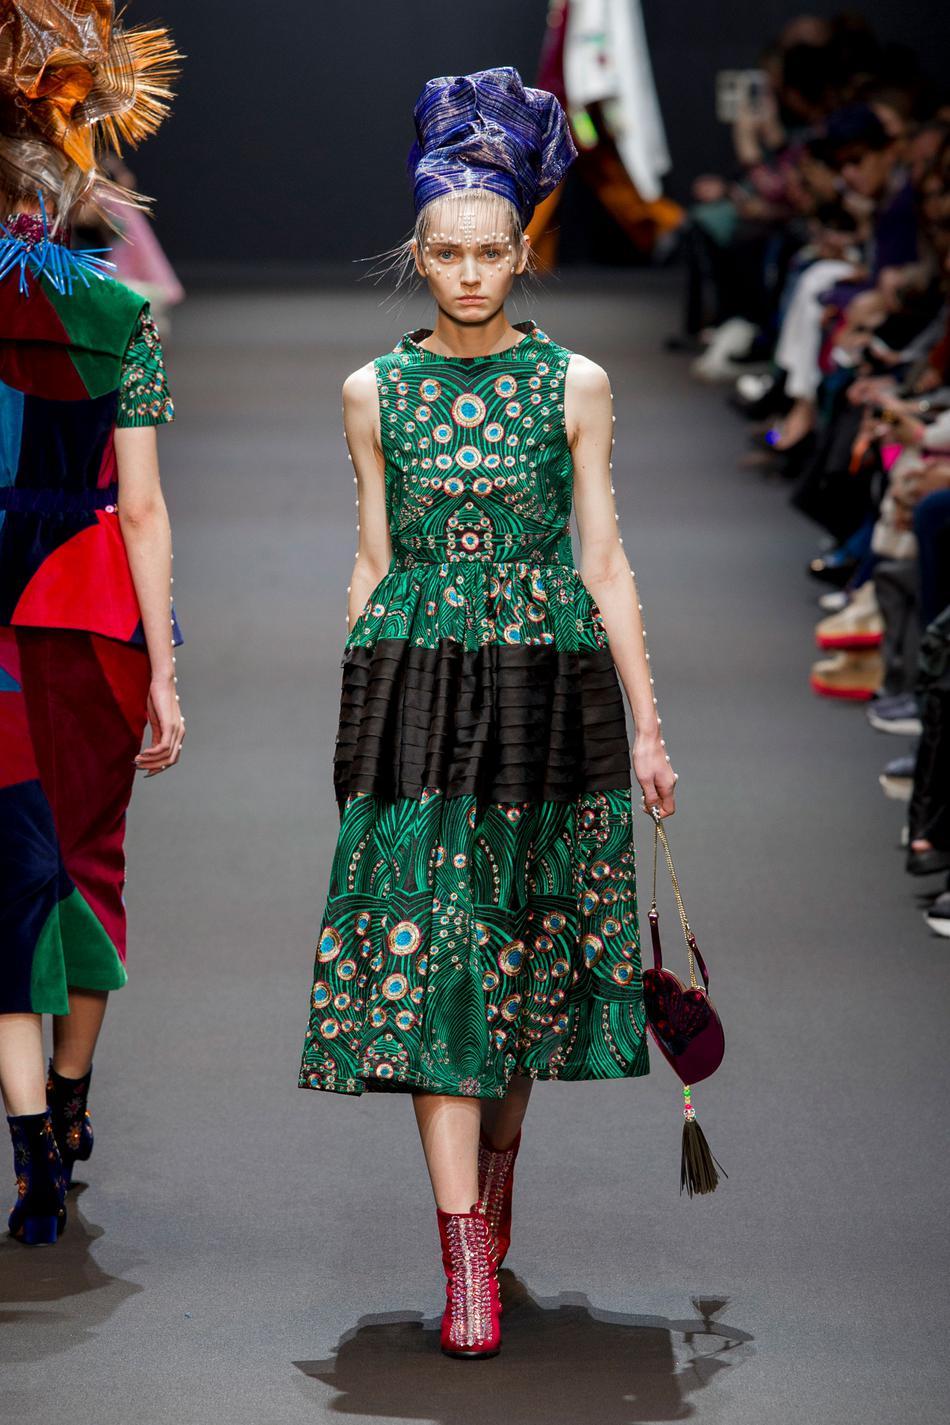 Défilé Manish Arora Fashion Week 2017 - Look 11